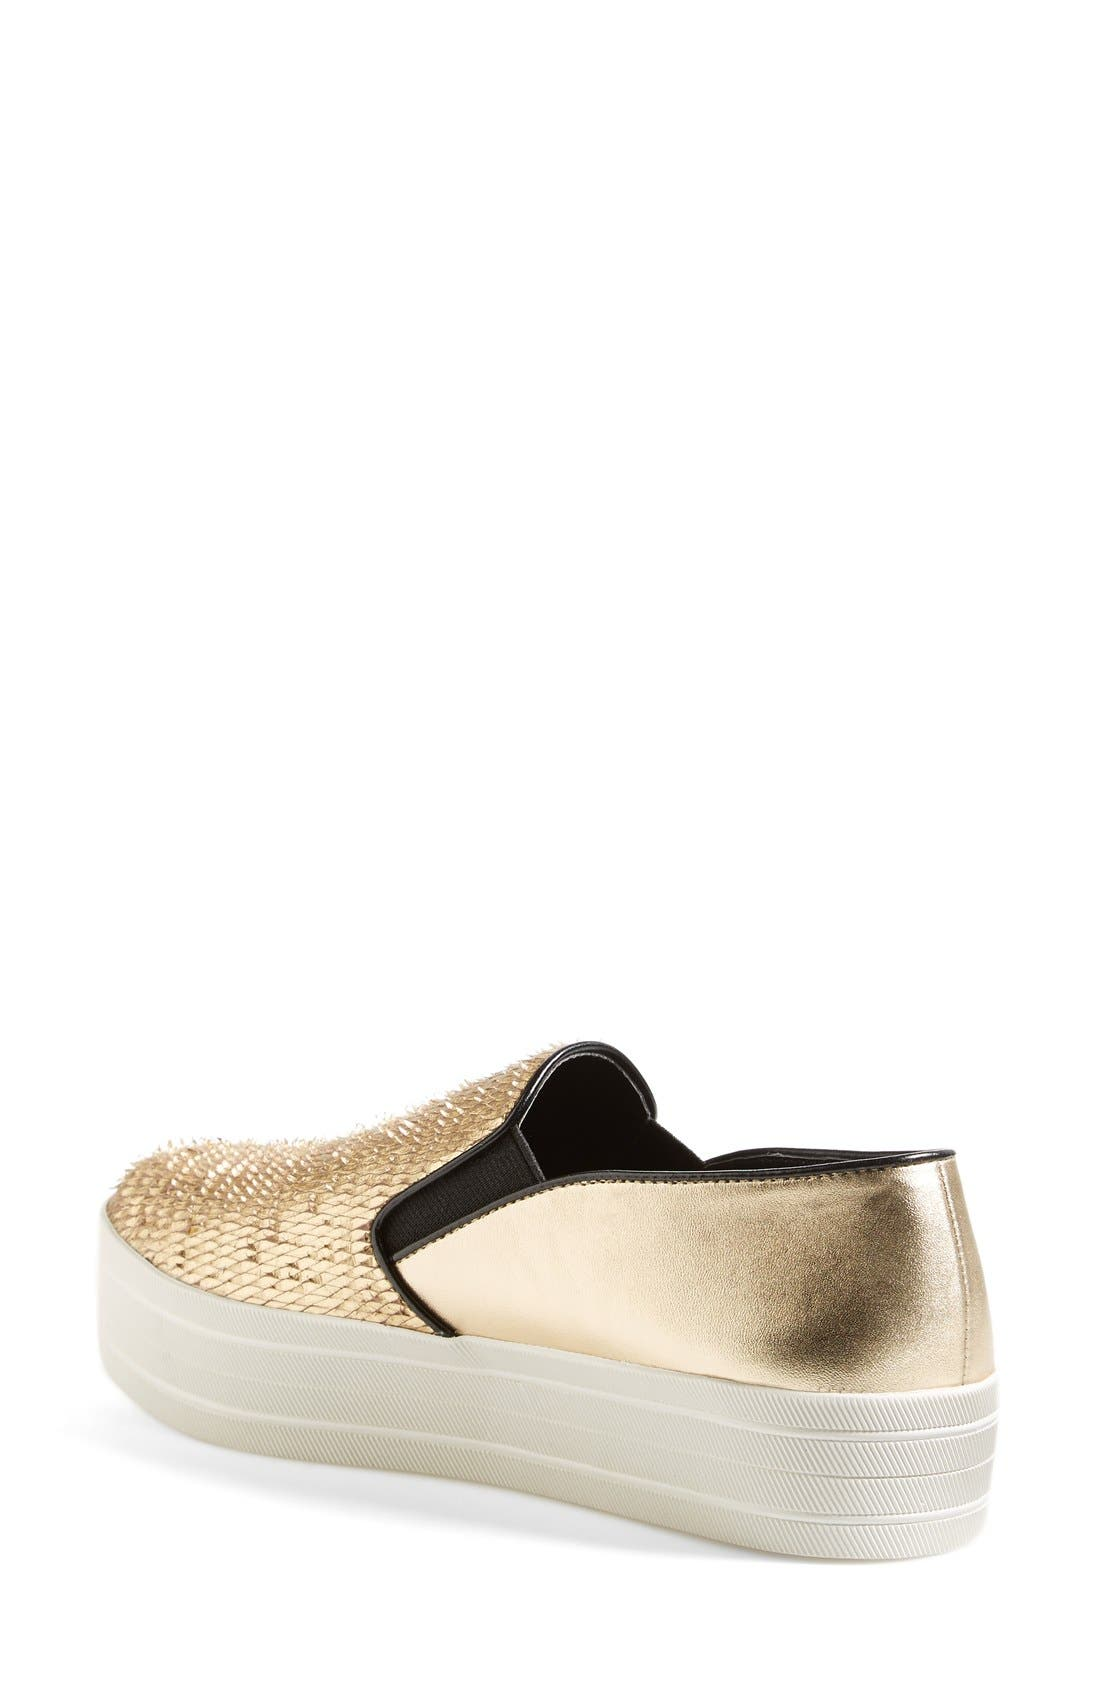 'Buhba' Slip-On Sneaker,                             Alternate thumbnail 9, color,